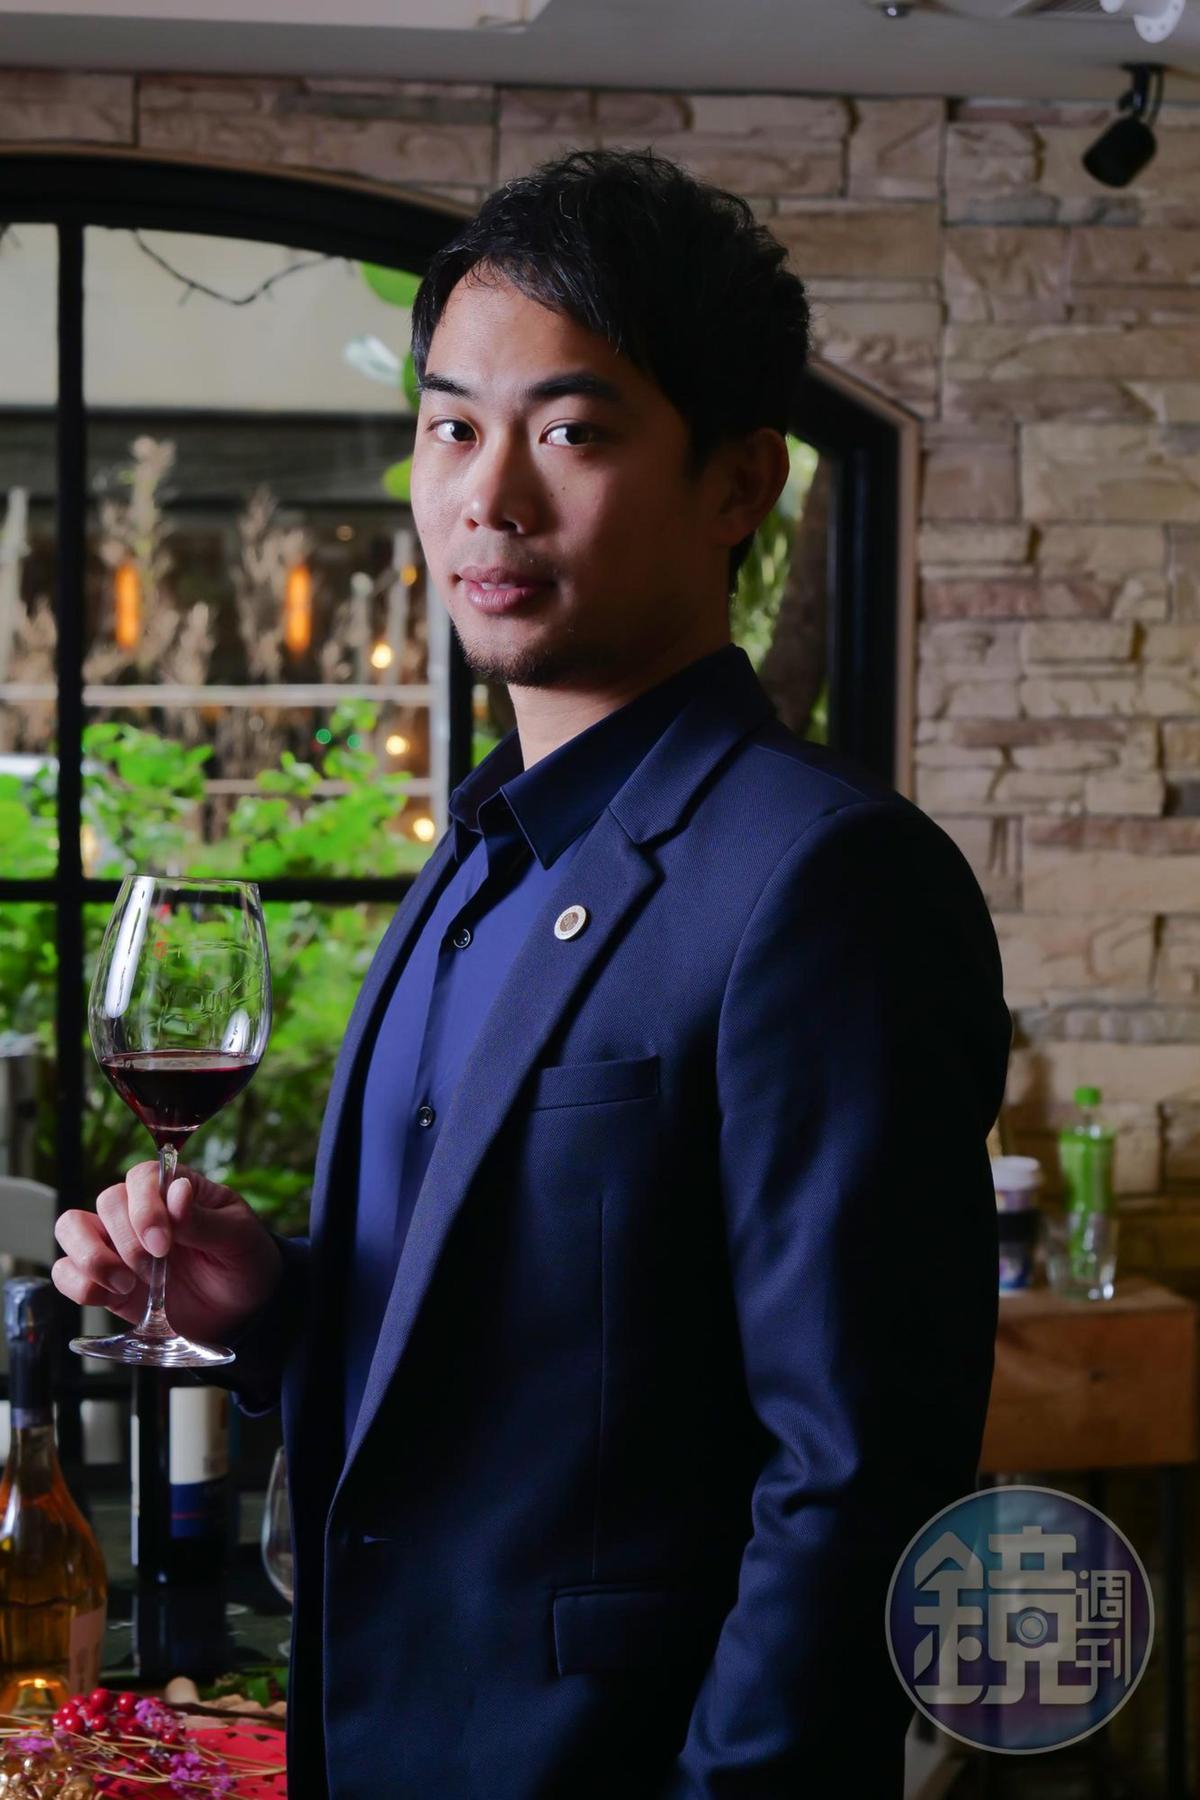 「50/45 Winehaus」創辦人陳笑軒(Alex)是貼心的侍酒師,總能適切回應客人需求建議選酒。